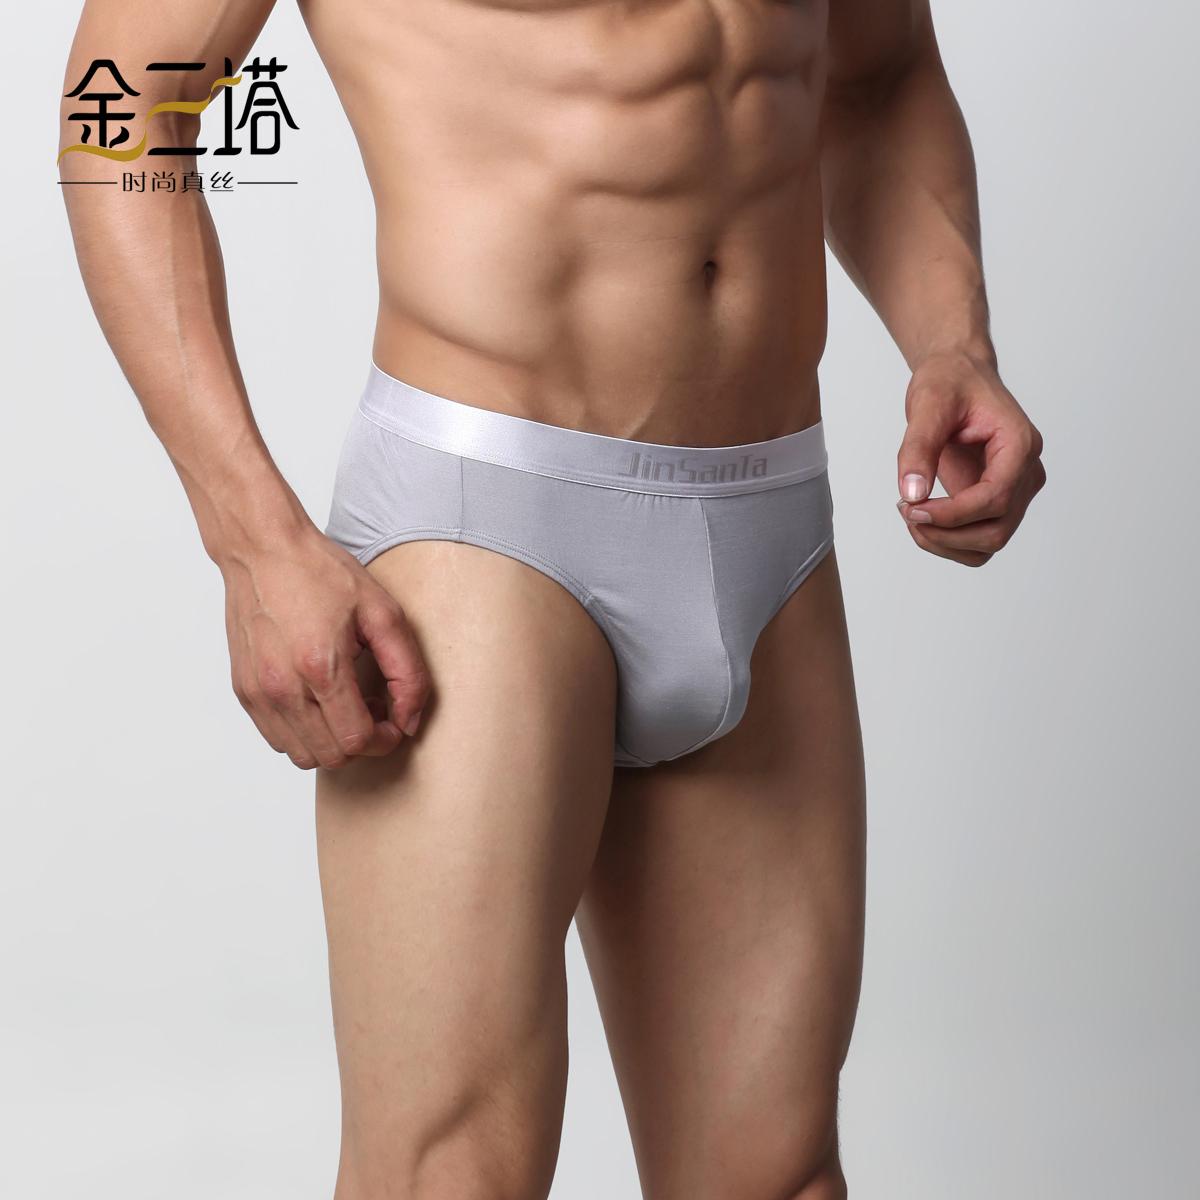 Coolmax fabric male panties moisture wicking breathable mid waist trigonometric panties(China (Mainland))